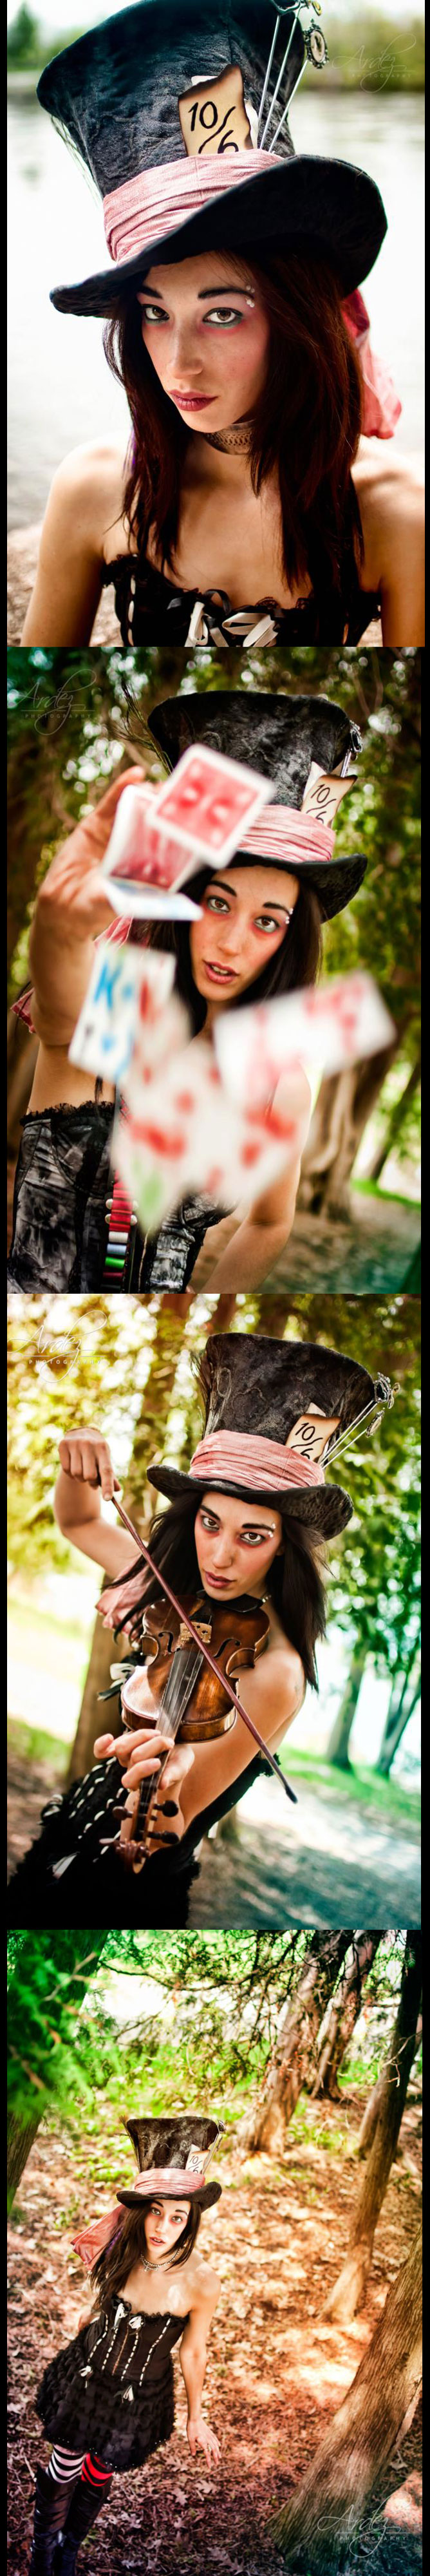 Male and Female model photo shoot of Ardez Photography and trechiq